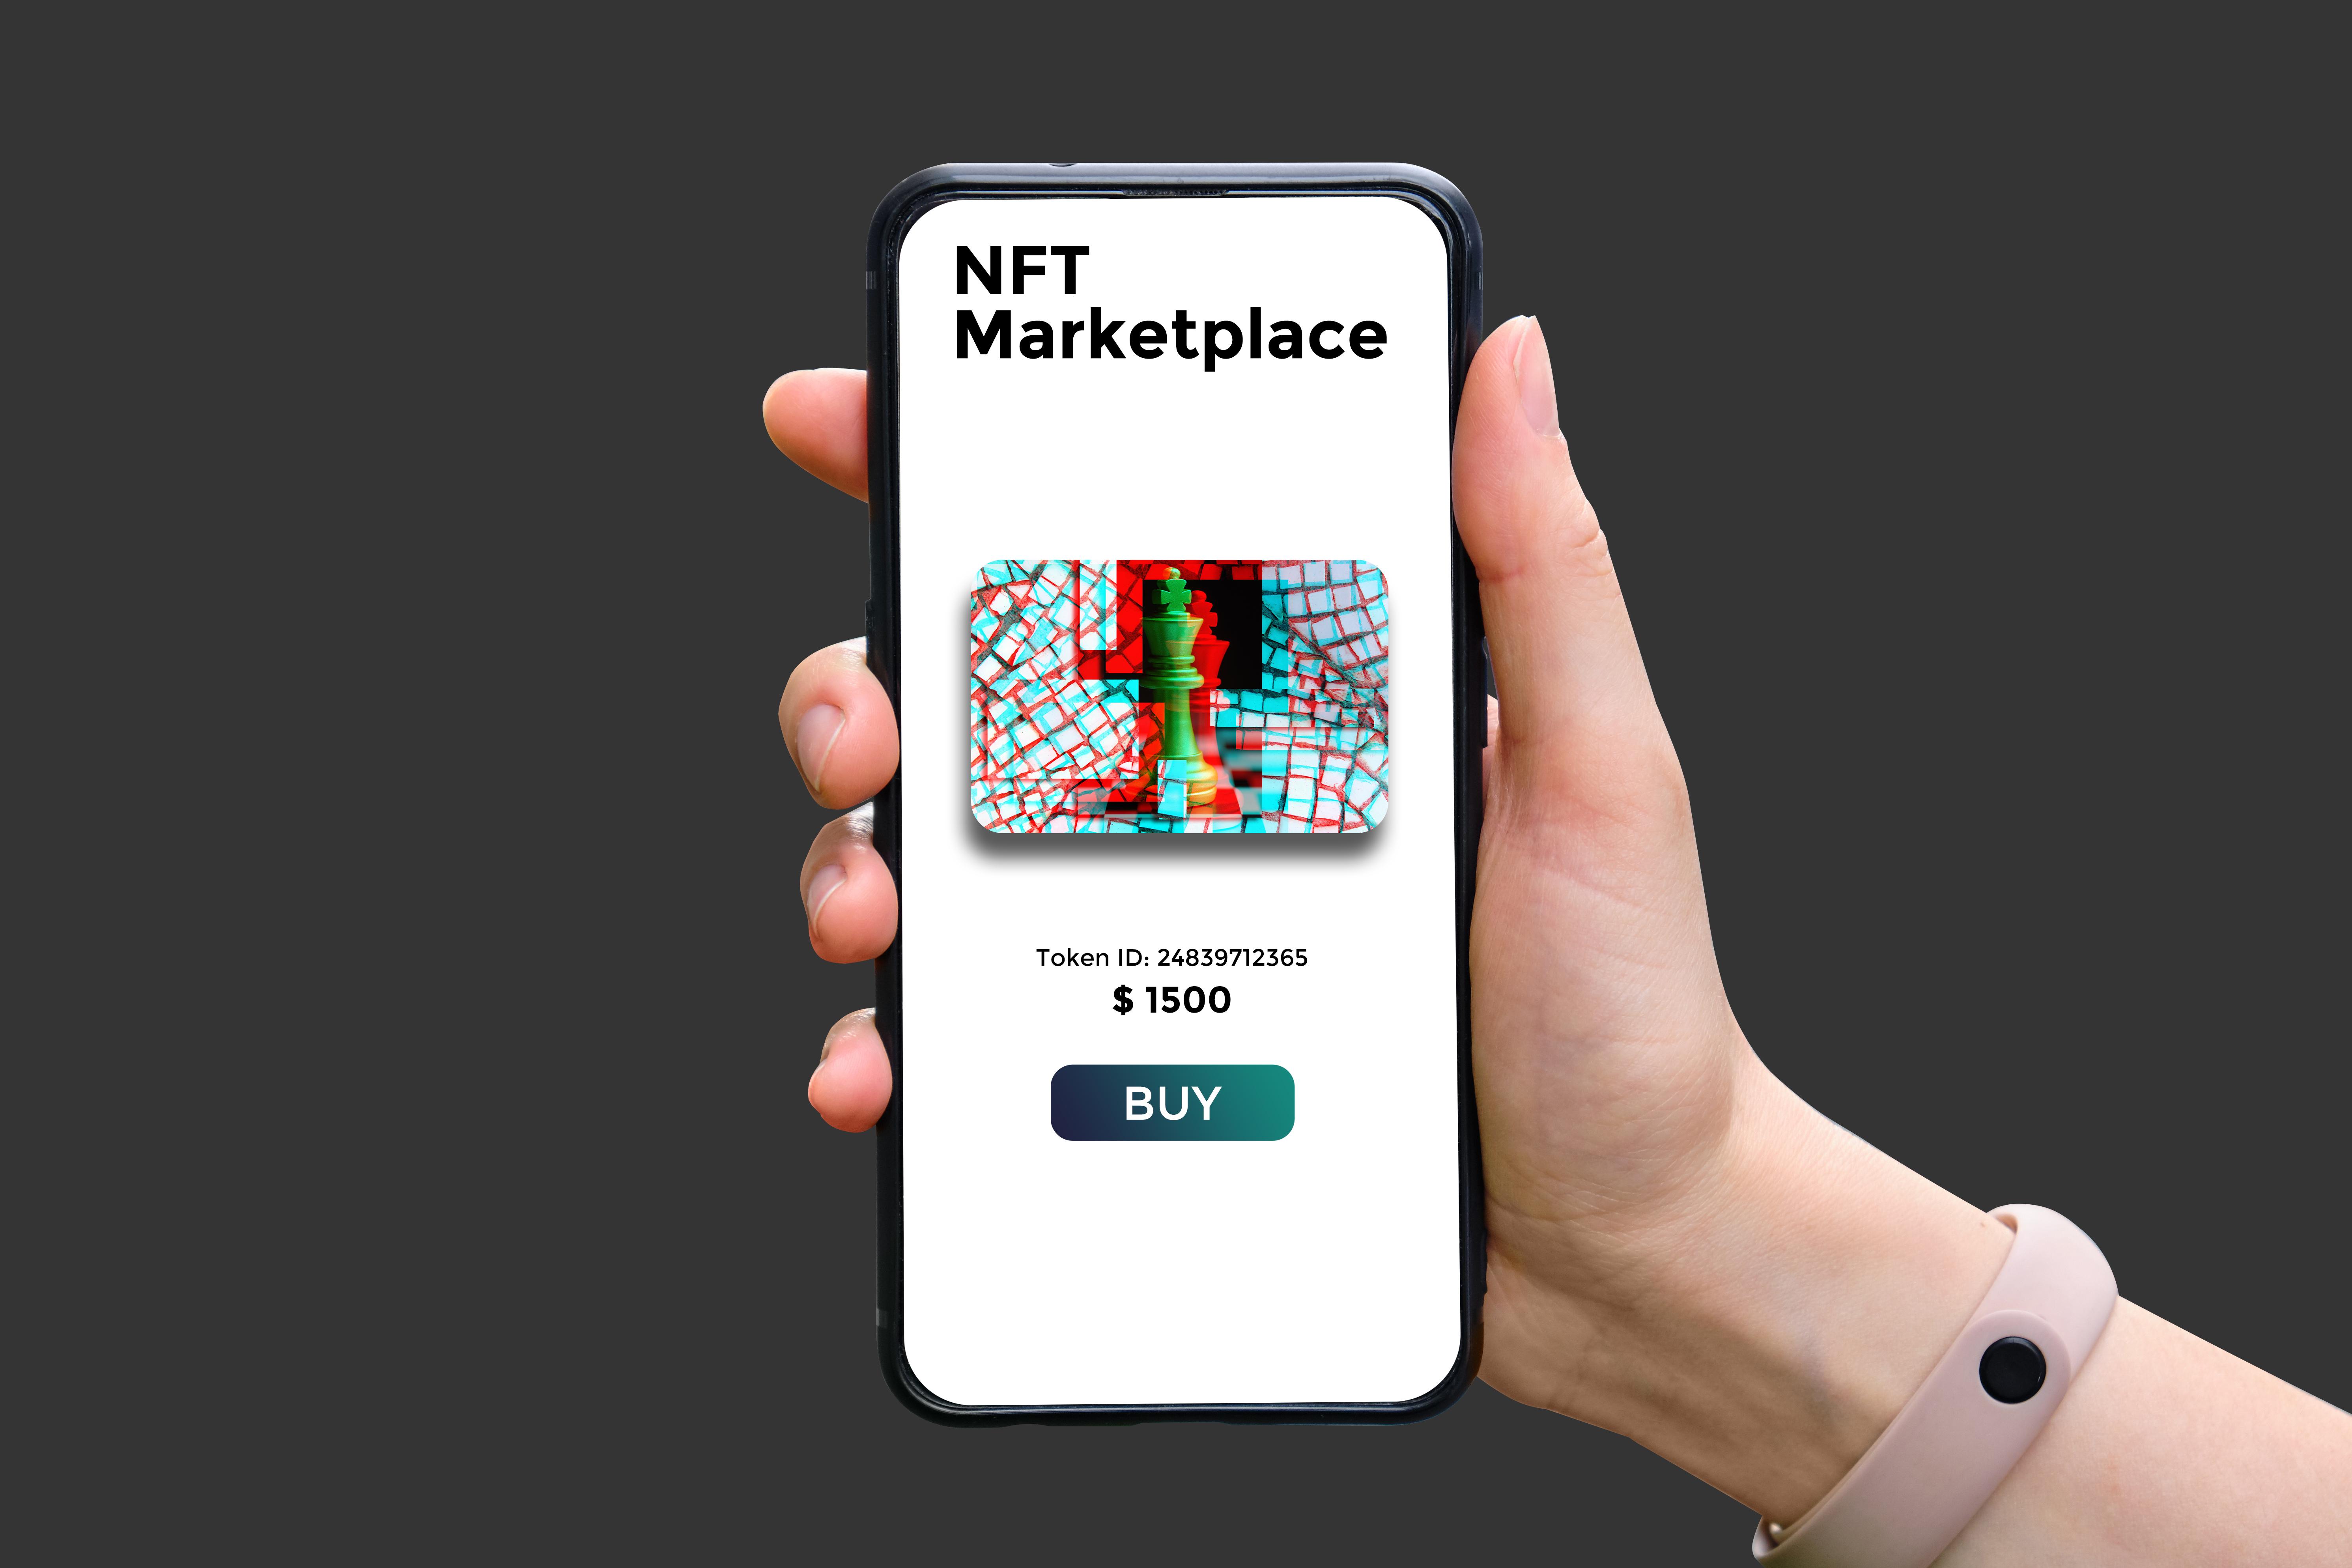 Representation of NFT Marketplace